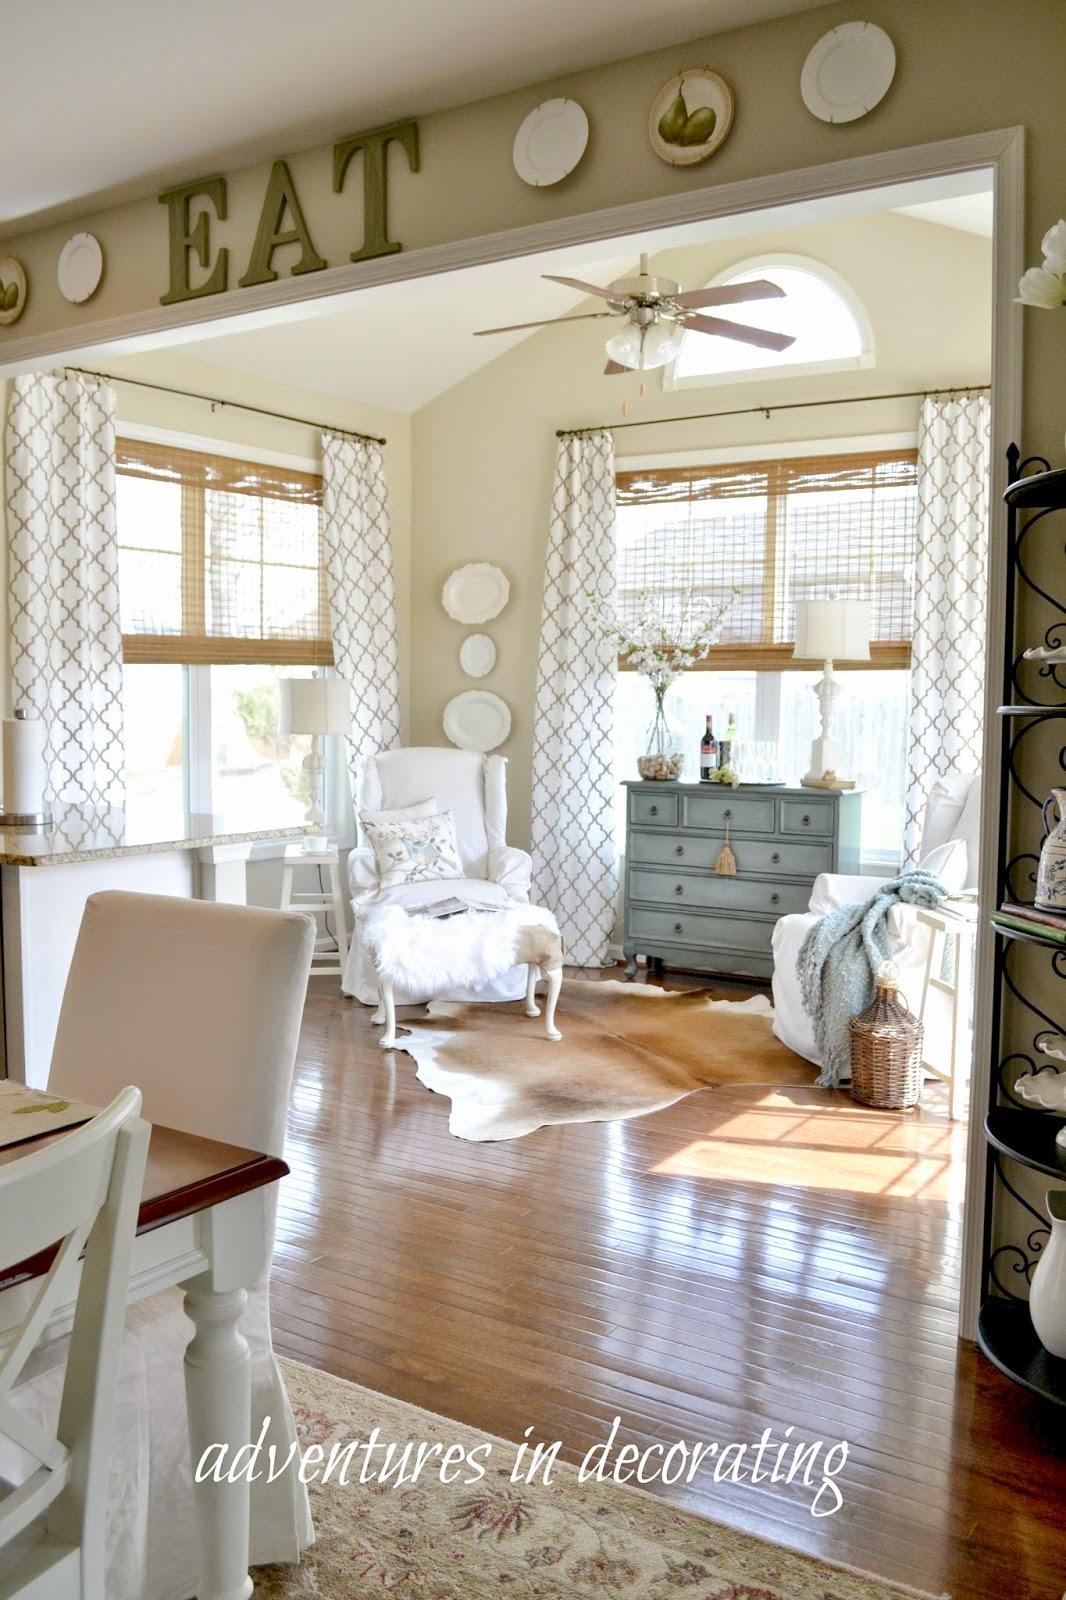 Adventures in decorating - Sunroom off kitchen design ideas ...